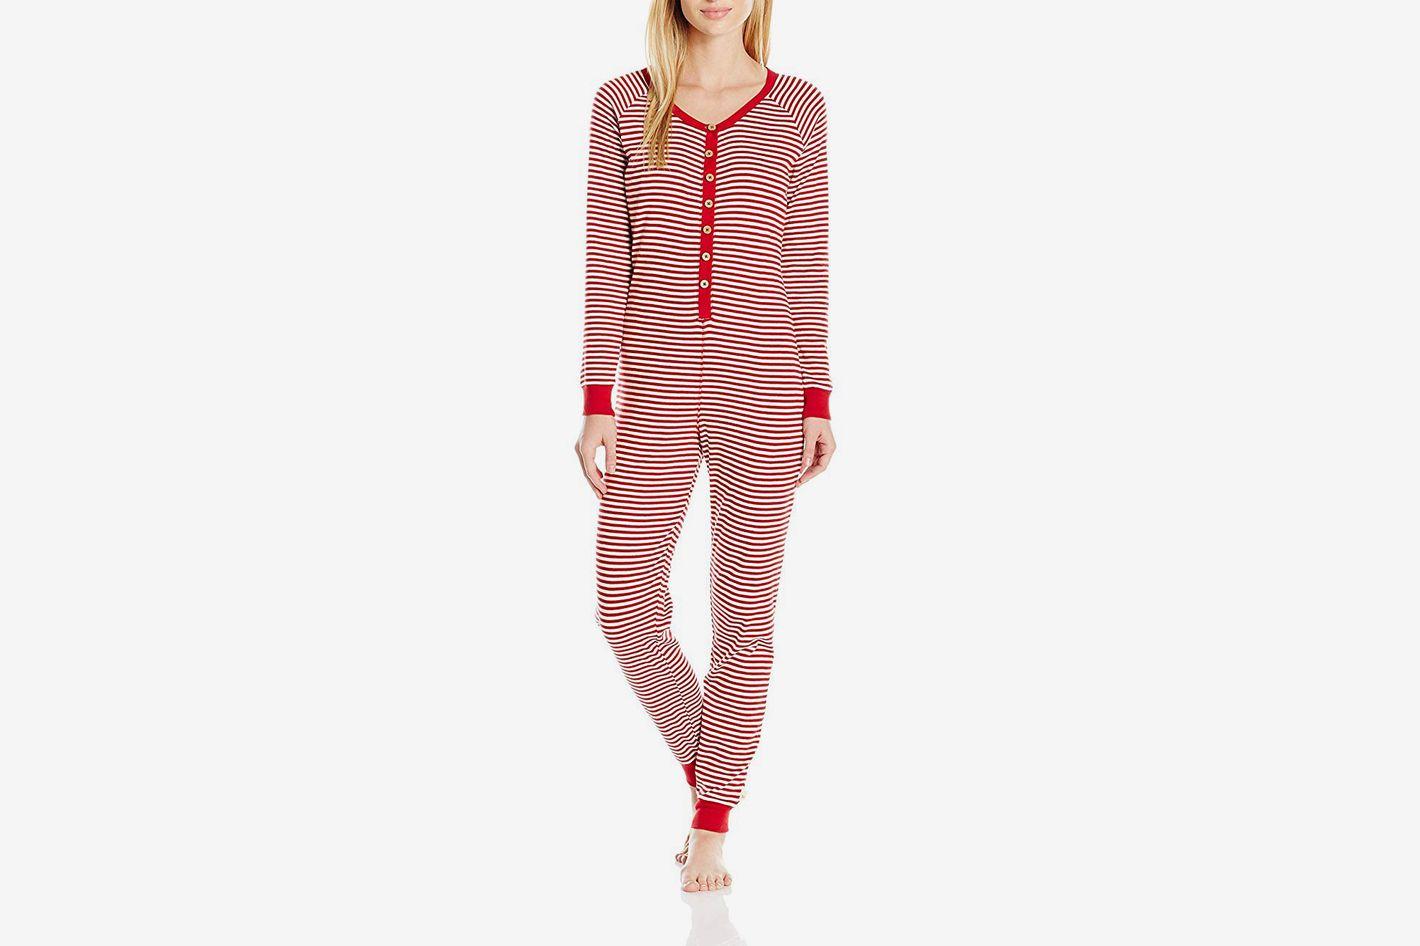 ebc3521ab1 Burt s Bees Baby Women s Onesie Pajamas